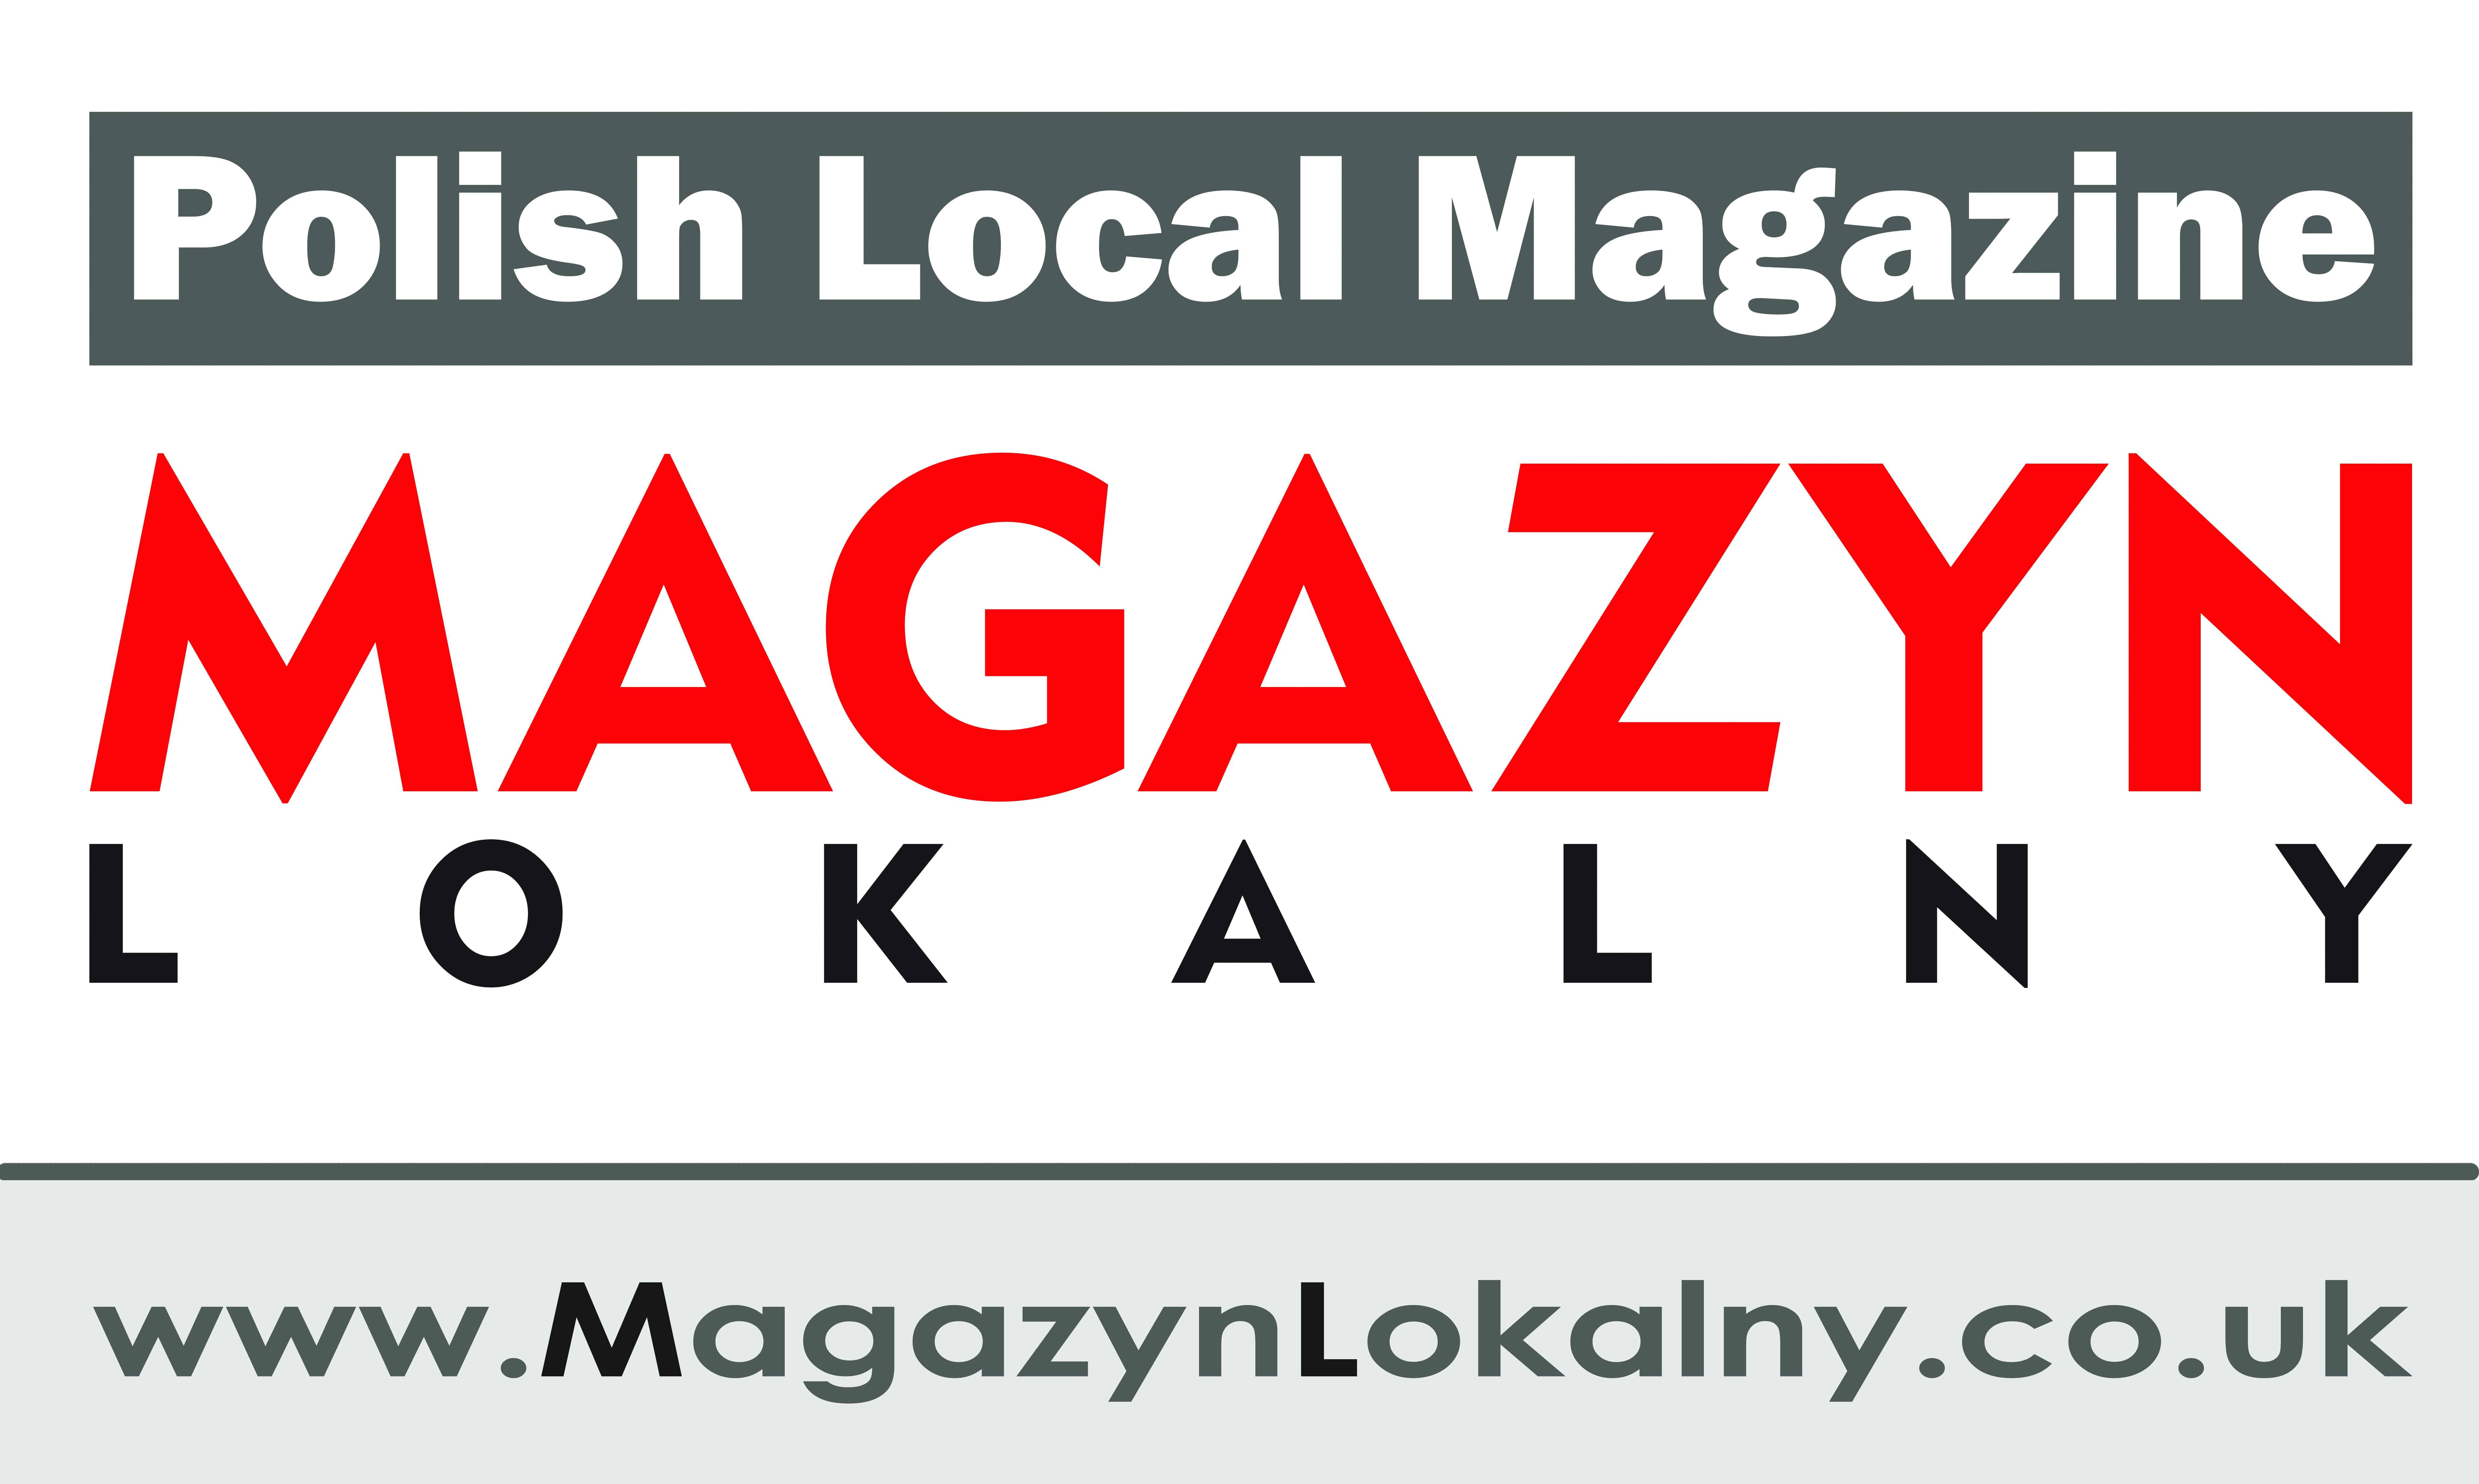 Polish Local magazine